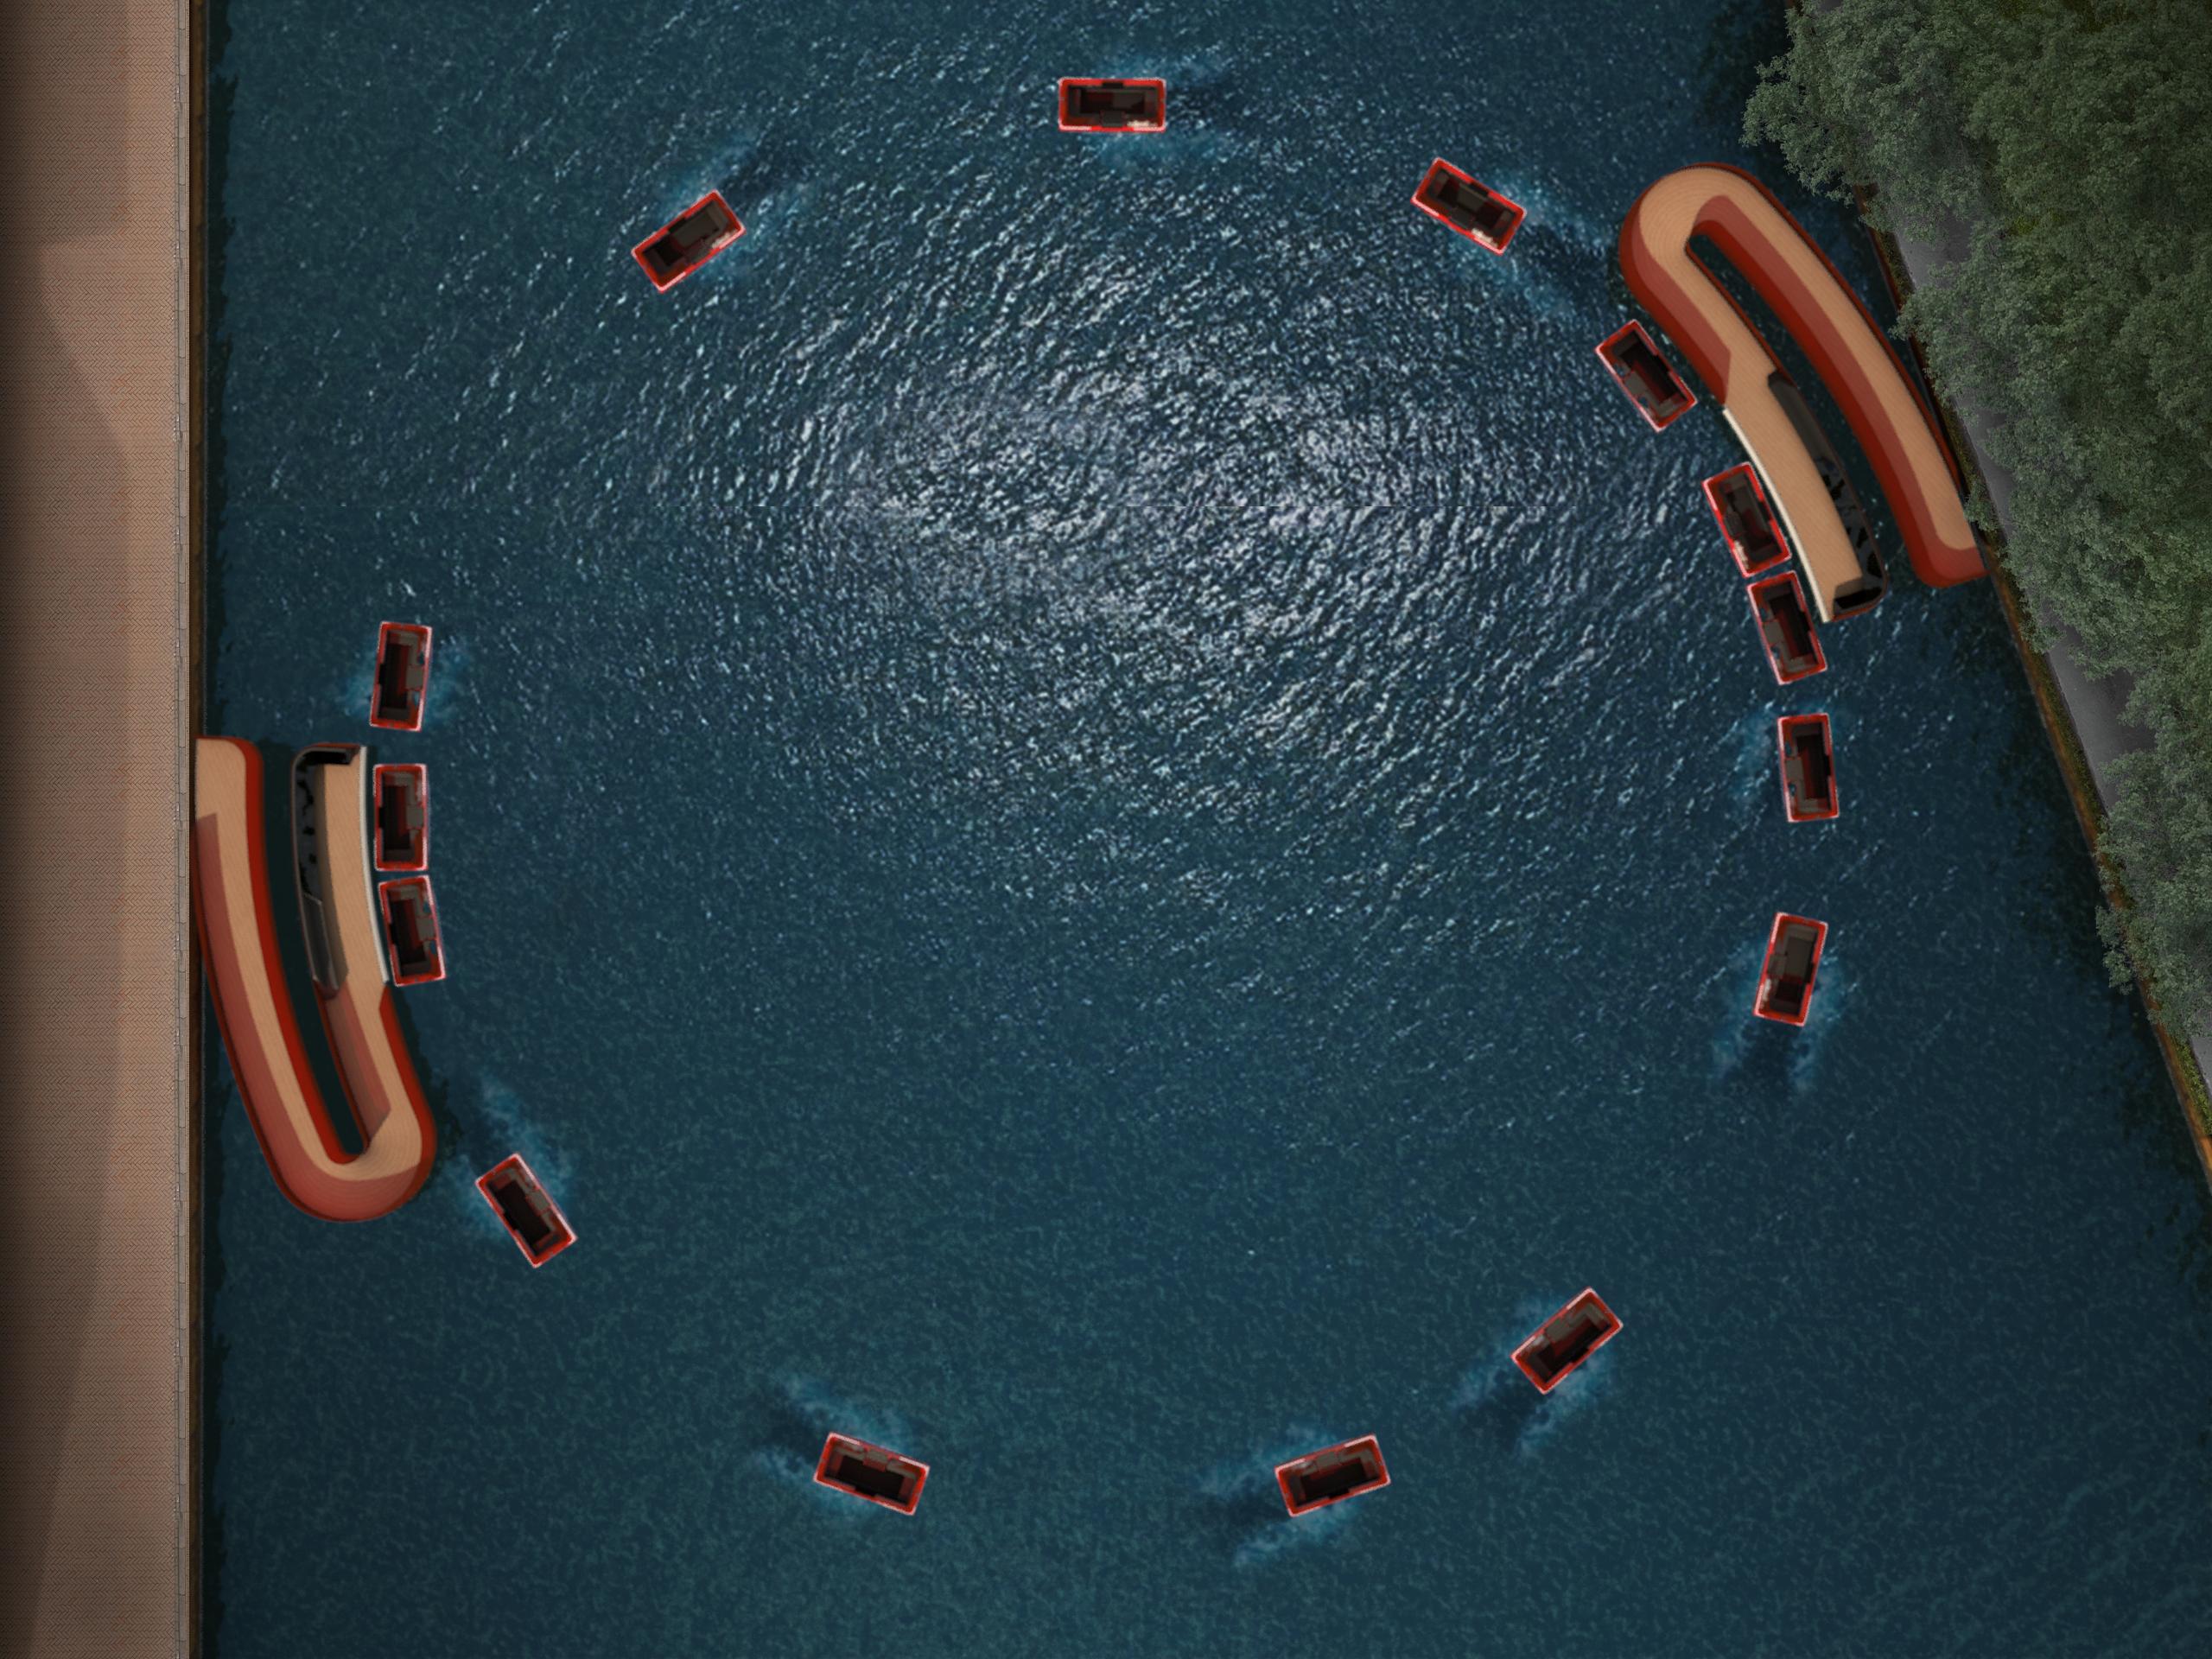 <p>RoundArdound: Zelfvarende &#8216;Roboat units&#8217; verbinden centrum Amsterdam met Marineterrein. Beeld Massachusetts Institute of Technology en Amsterdam Institute for Advanced Metropolitan Solutions</p>